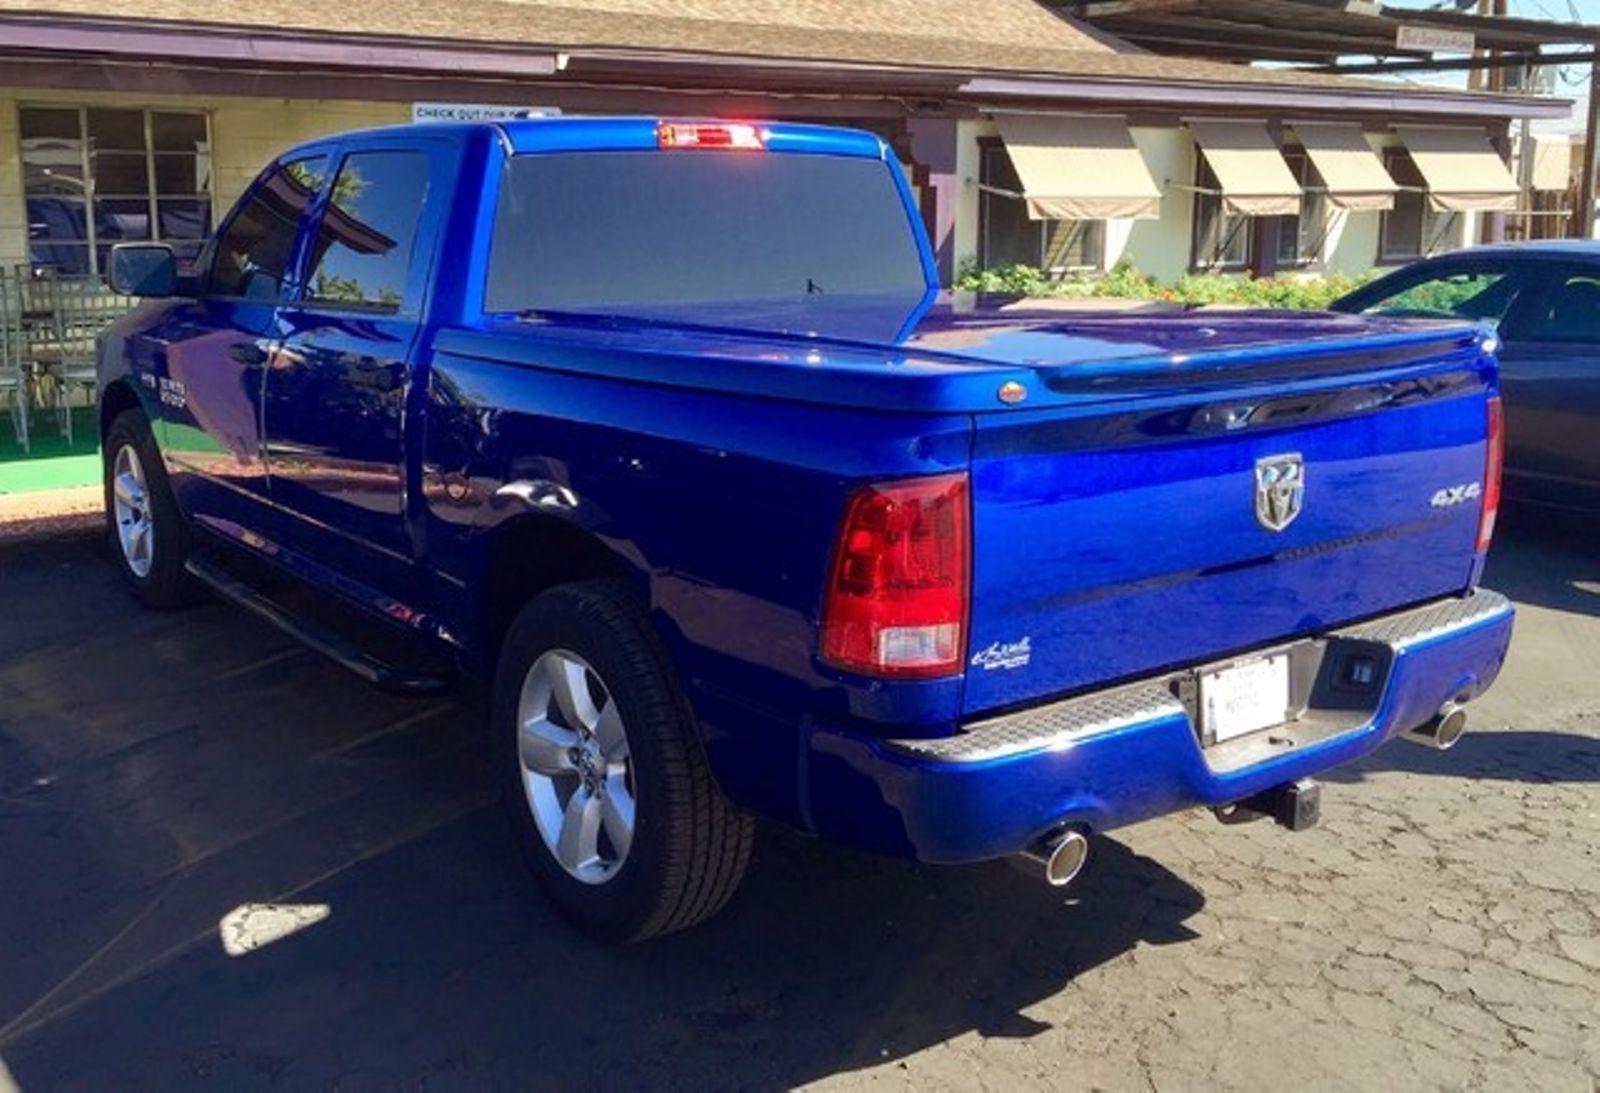 New Dodge Durango For Sale   Peoria, AZ   Dodge Dealership ...